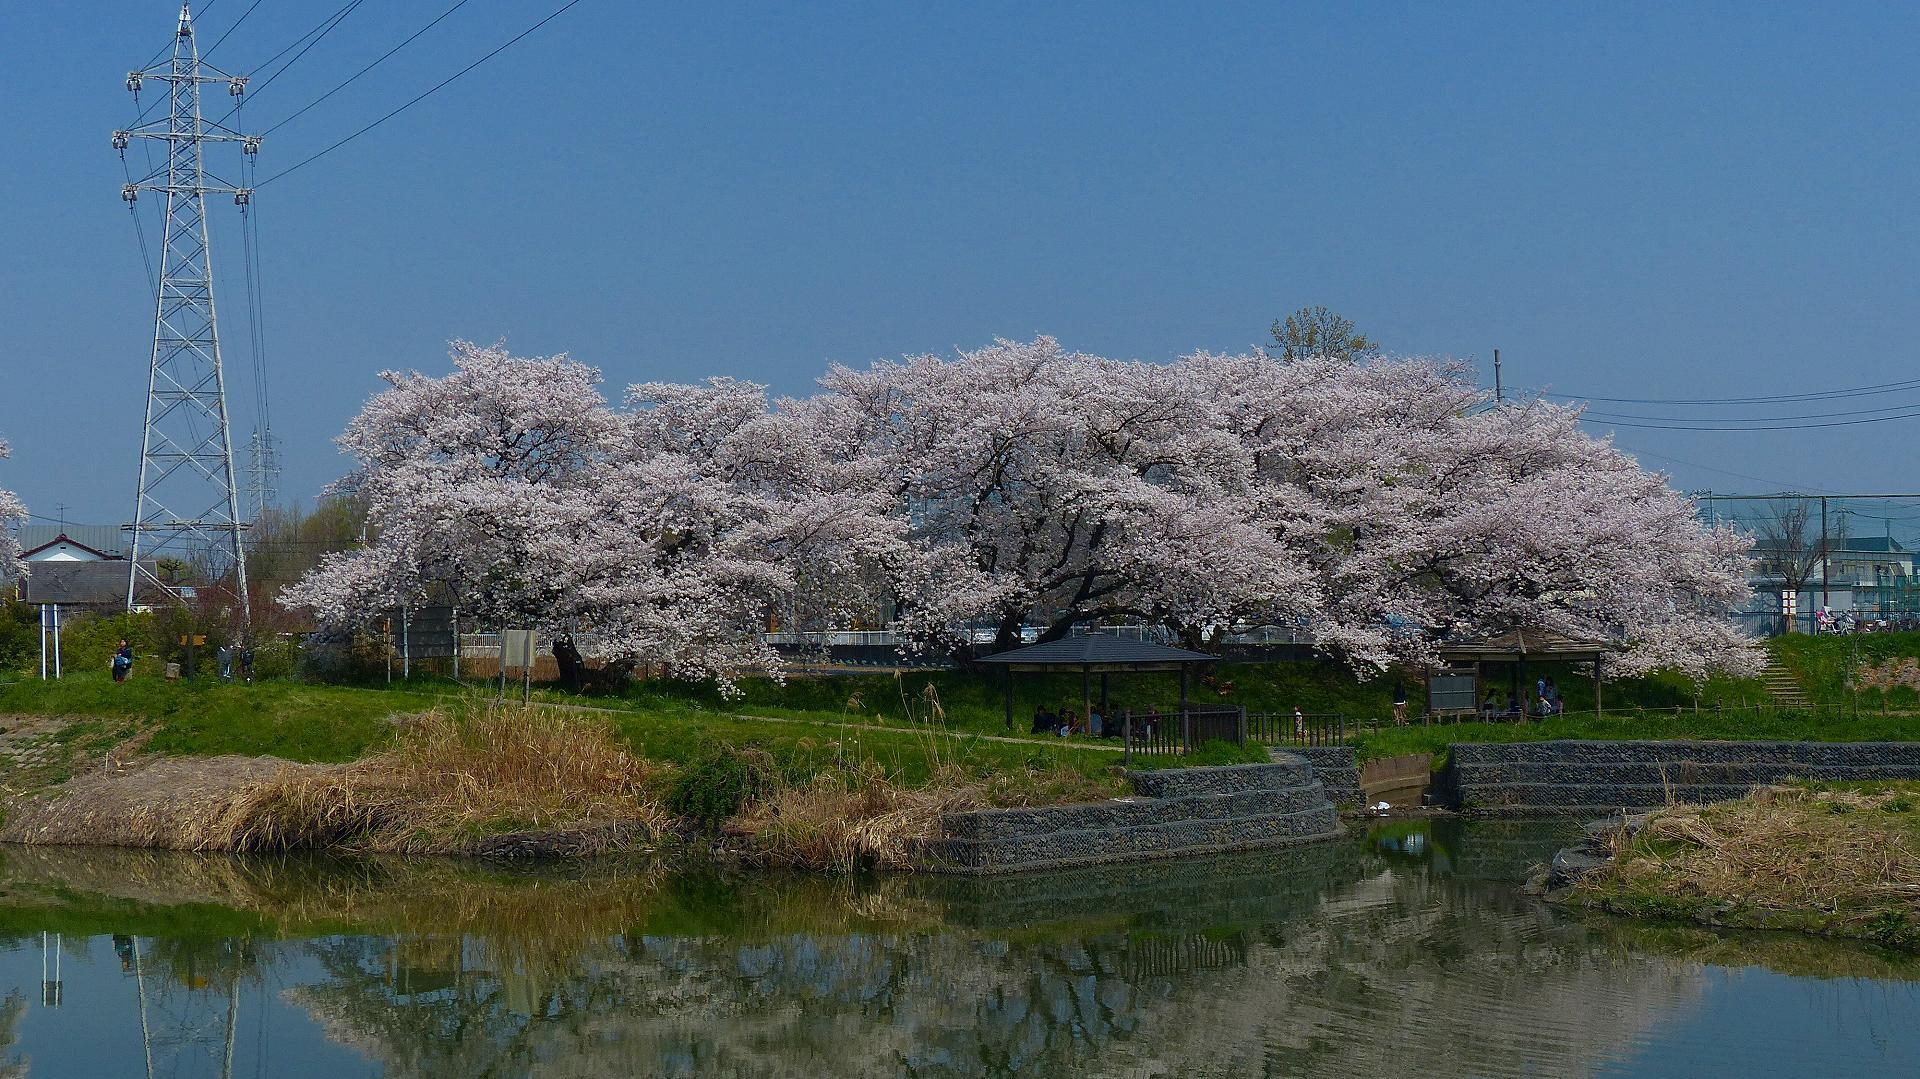 満開の桜を堪能! 【 2018 3/28(水) 】_a0185081_19293760.jpg